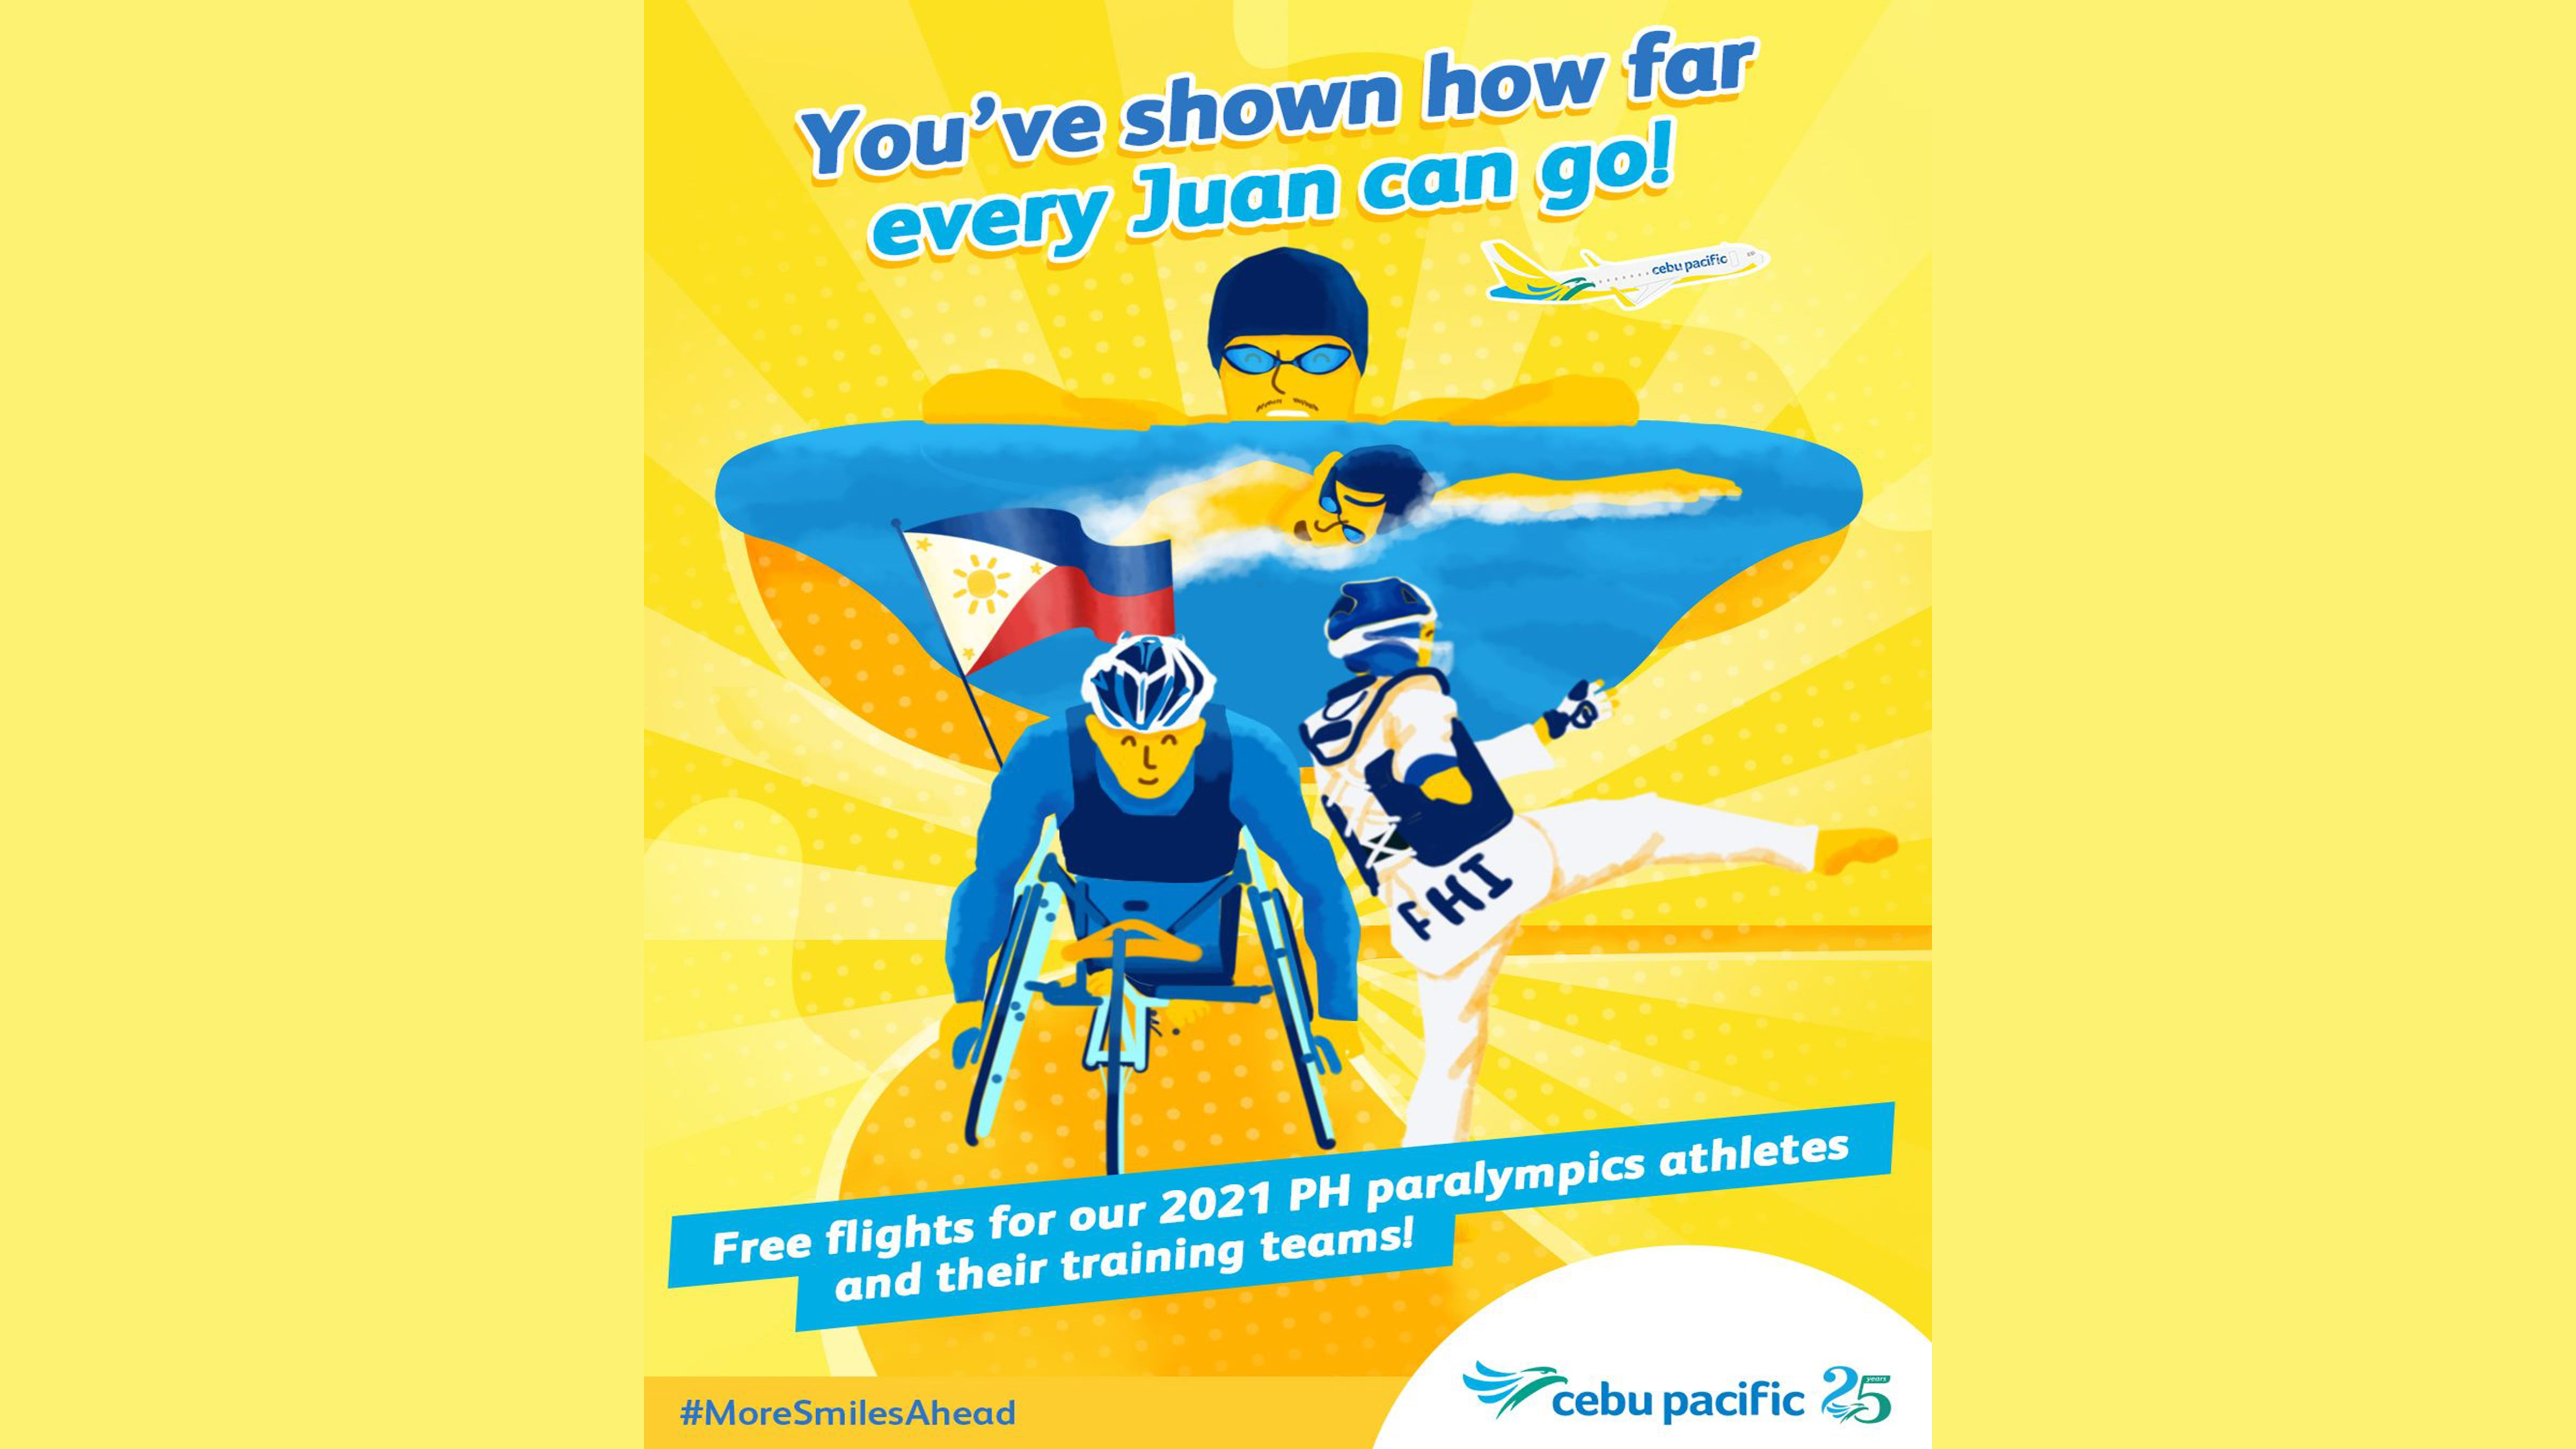 Show of gratitude; Cebu Pac gives free flights to Filipino Paralympic athletes photo from Cebu Pacific Air